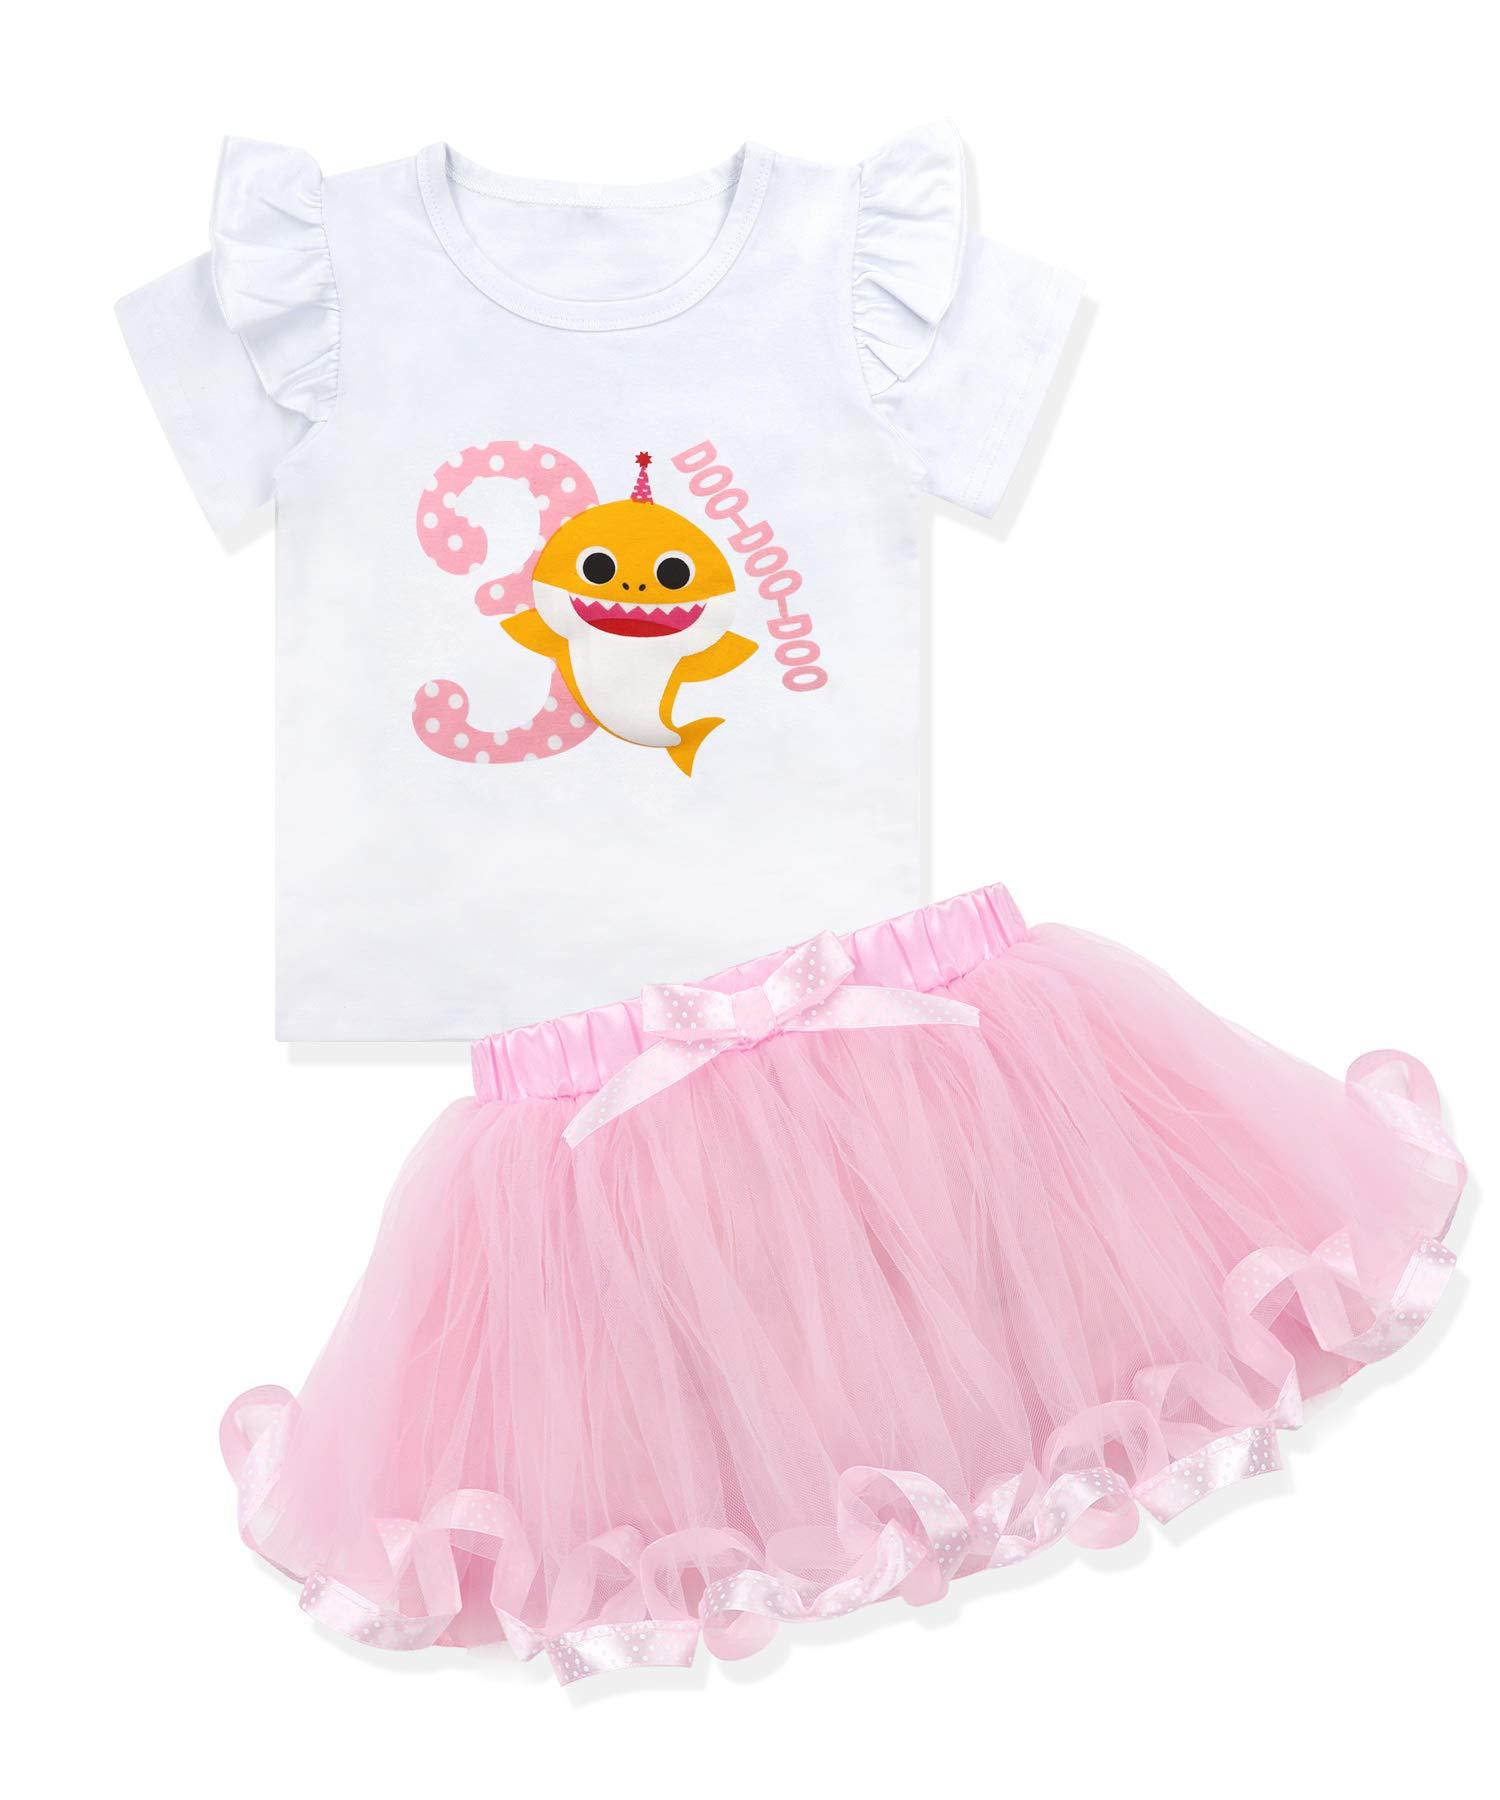 Baby Girls Shark Doo Doo Doo Romper Tutu Dress 1st Birthday Outfit Set